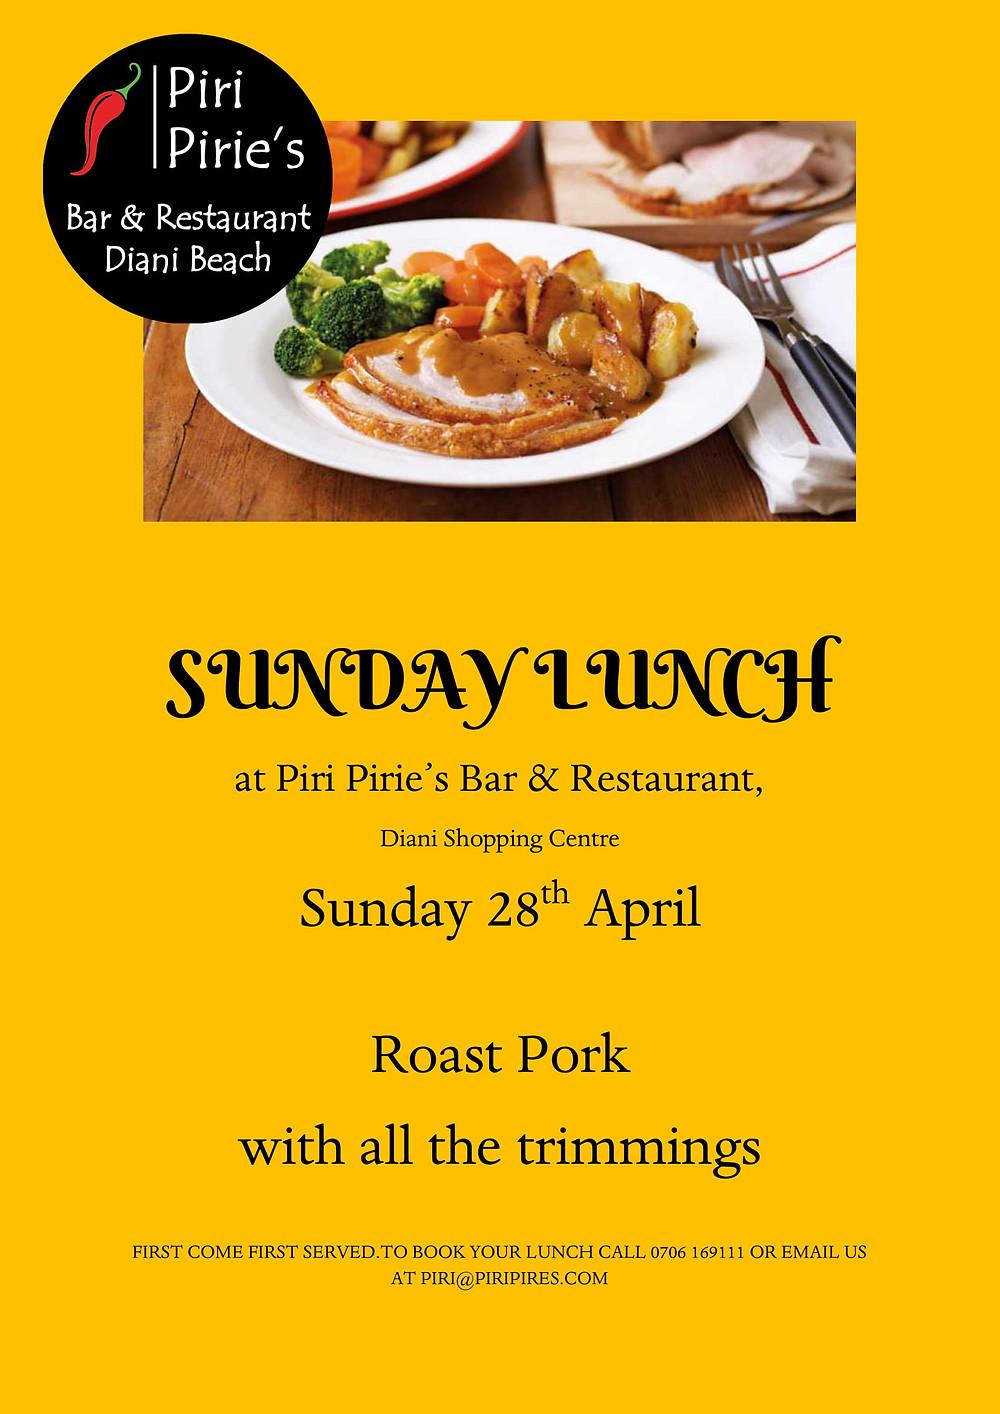 Roast Pork for Sunday Lunch 28th April.@ Piri Piries